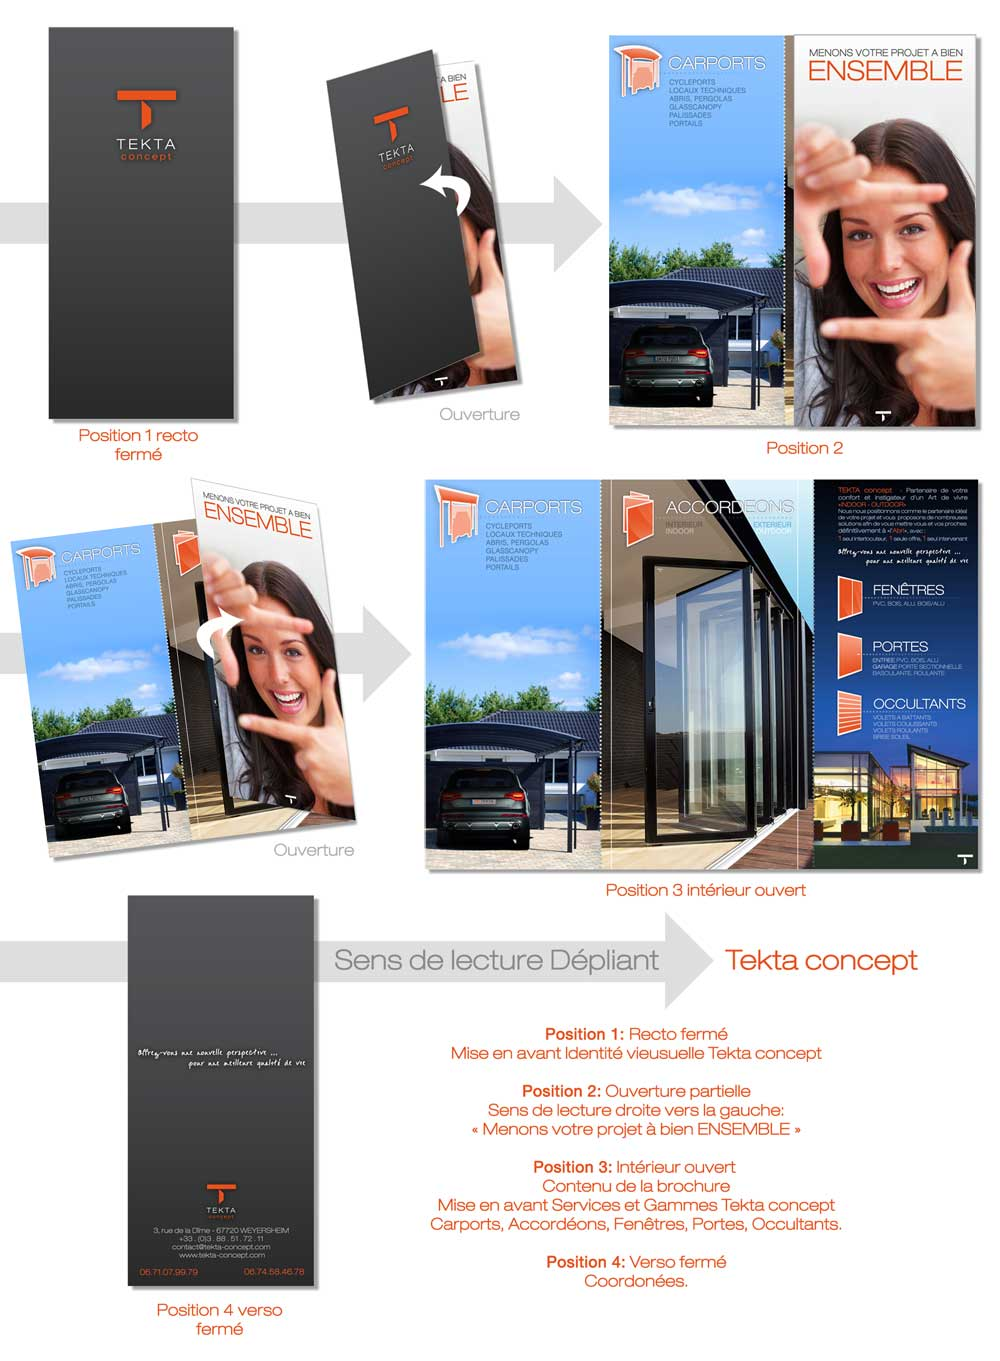 Tekta-concept-dépliant-studio-creatif